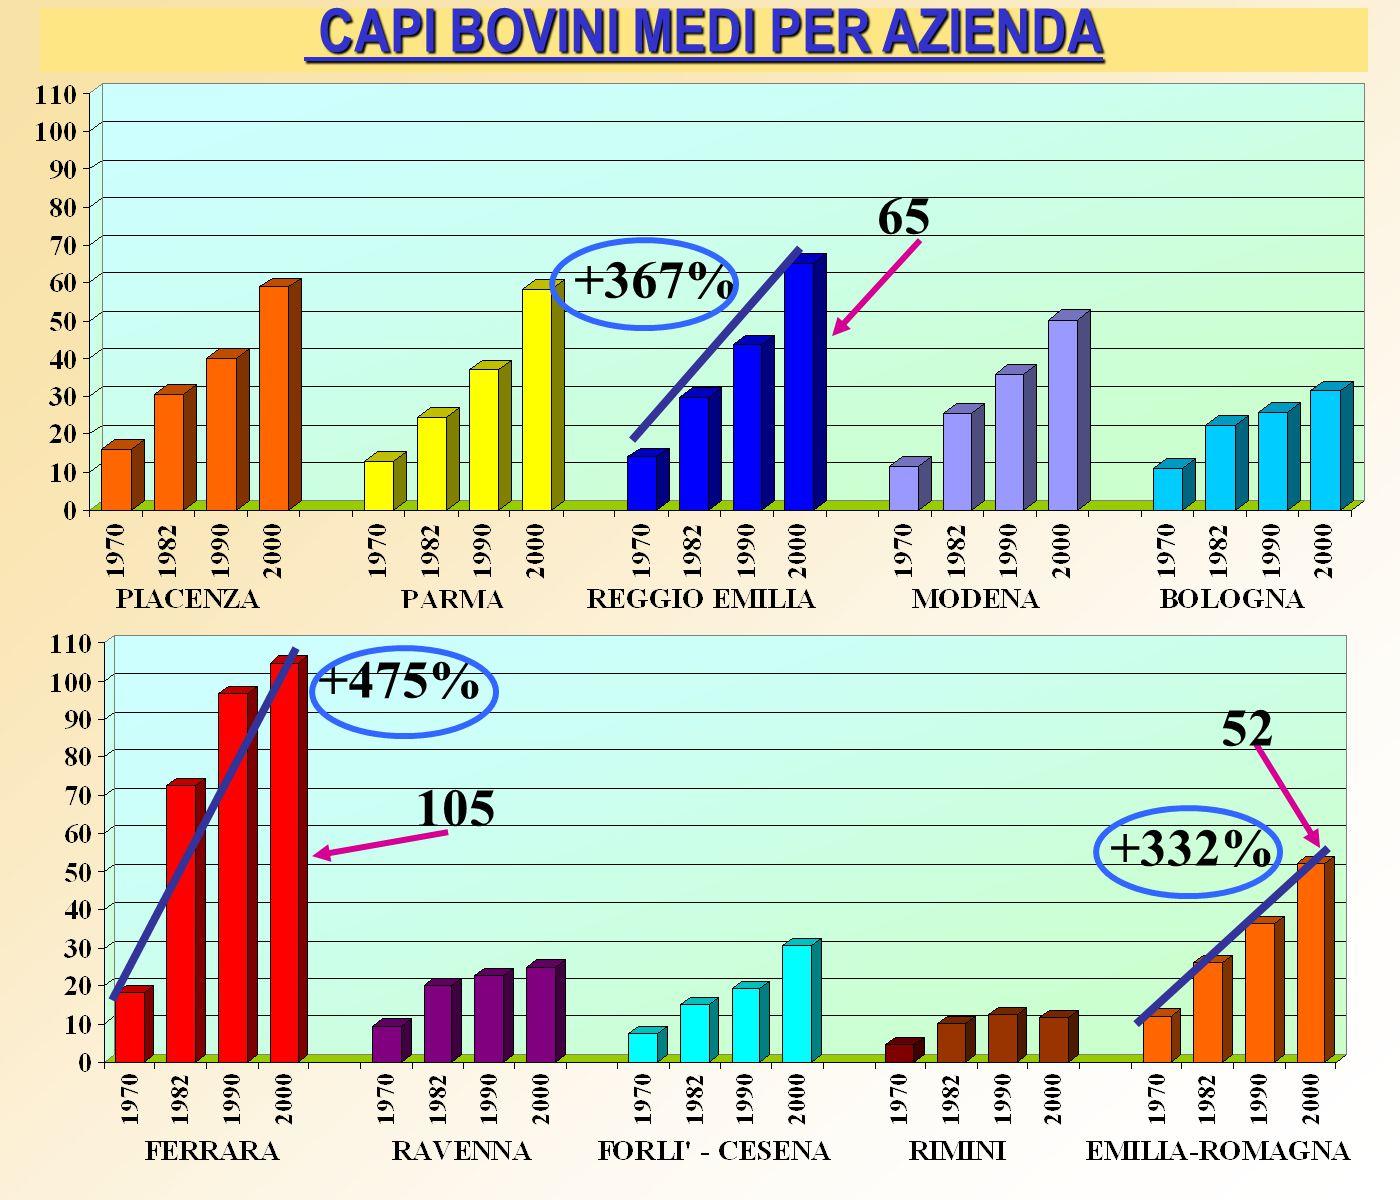 CAPI BOVINI MEDI PER AZIENDA CAPI BOVINI MEDI PER AZIENDA +367% +475% +332% 65 105 52